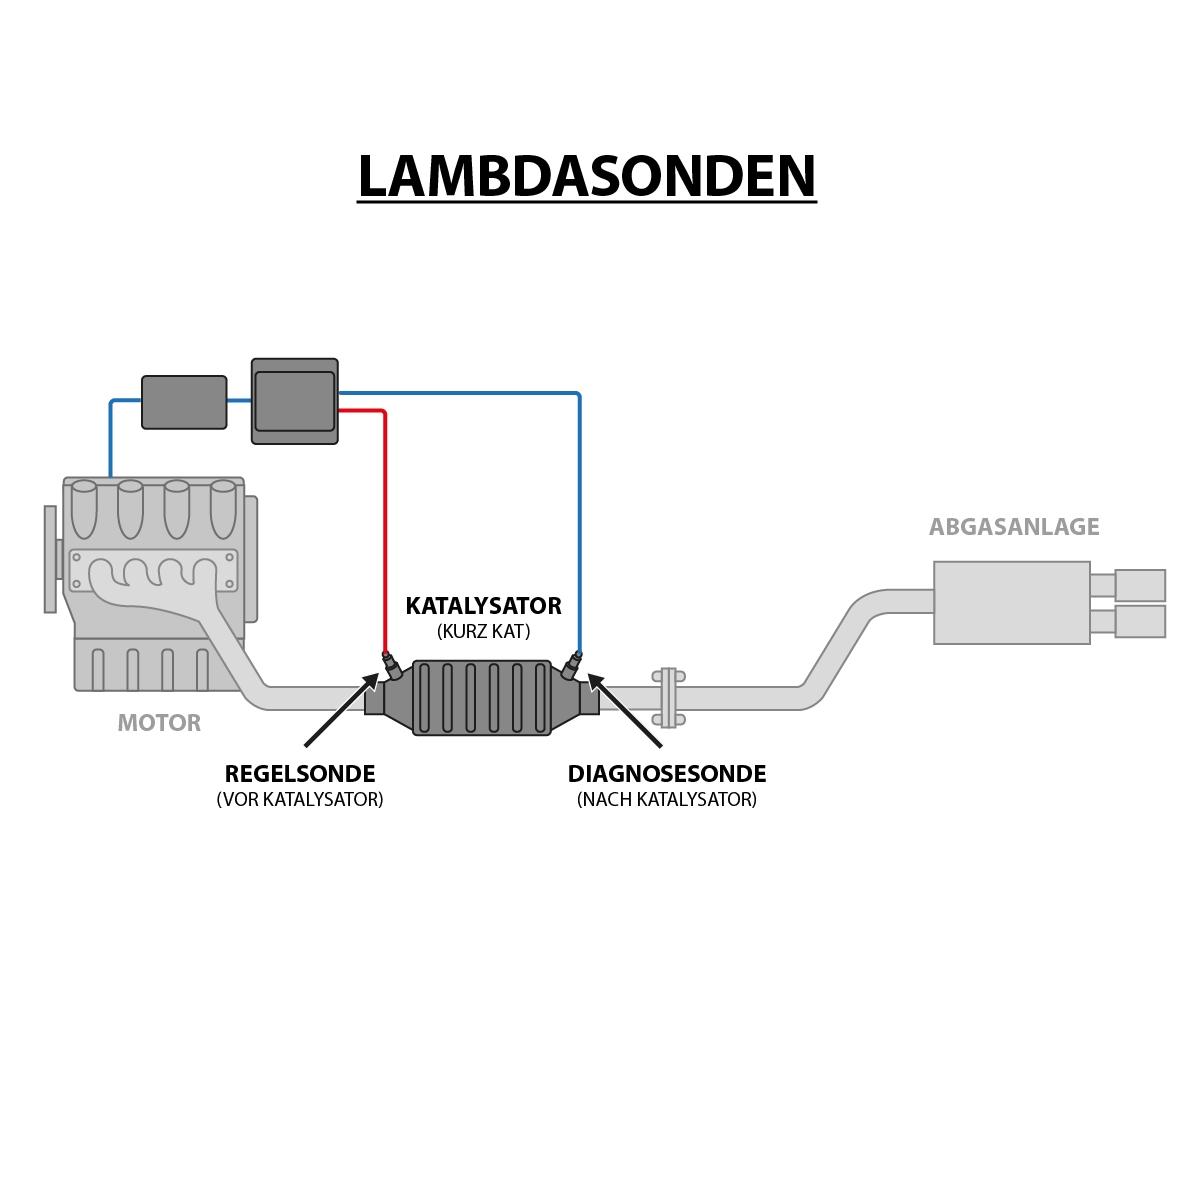 Lambdasonde Regelsonde vor Katalysator für Opel Astra Vectra Calibra 1.8L-3.0L